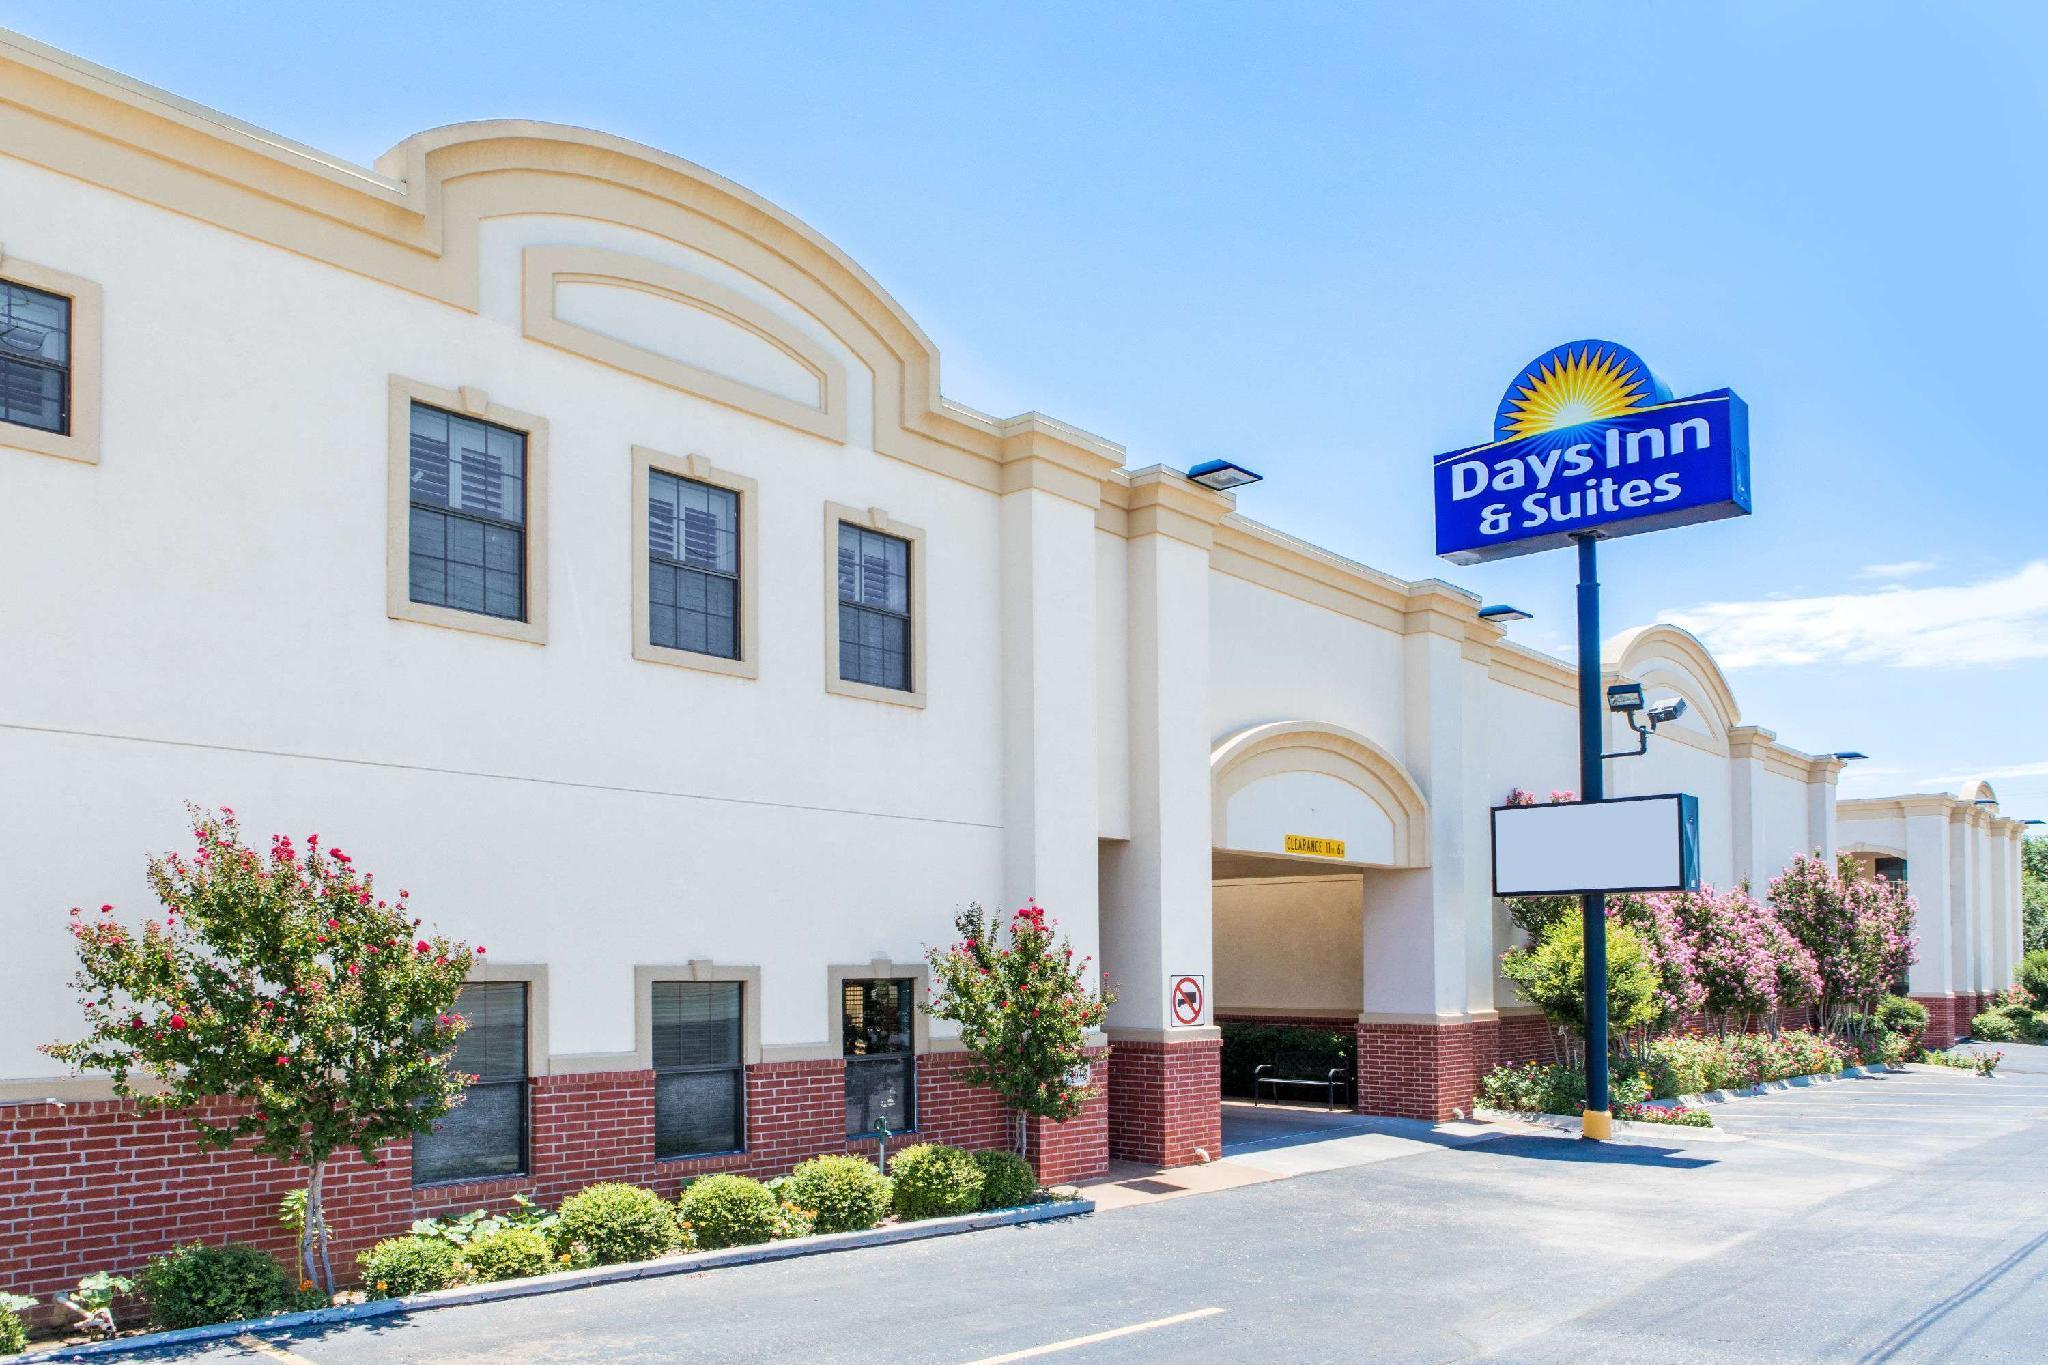 Days Inn And Suites By Wyndham Big Spring